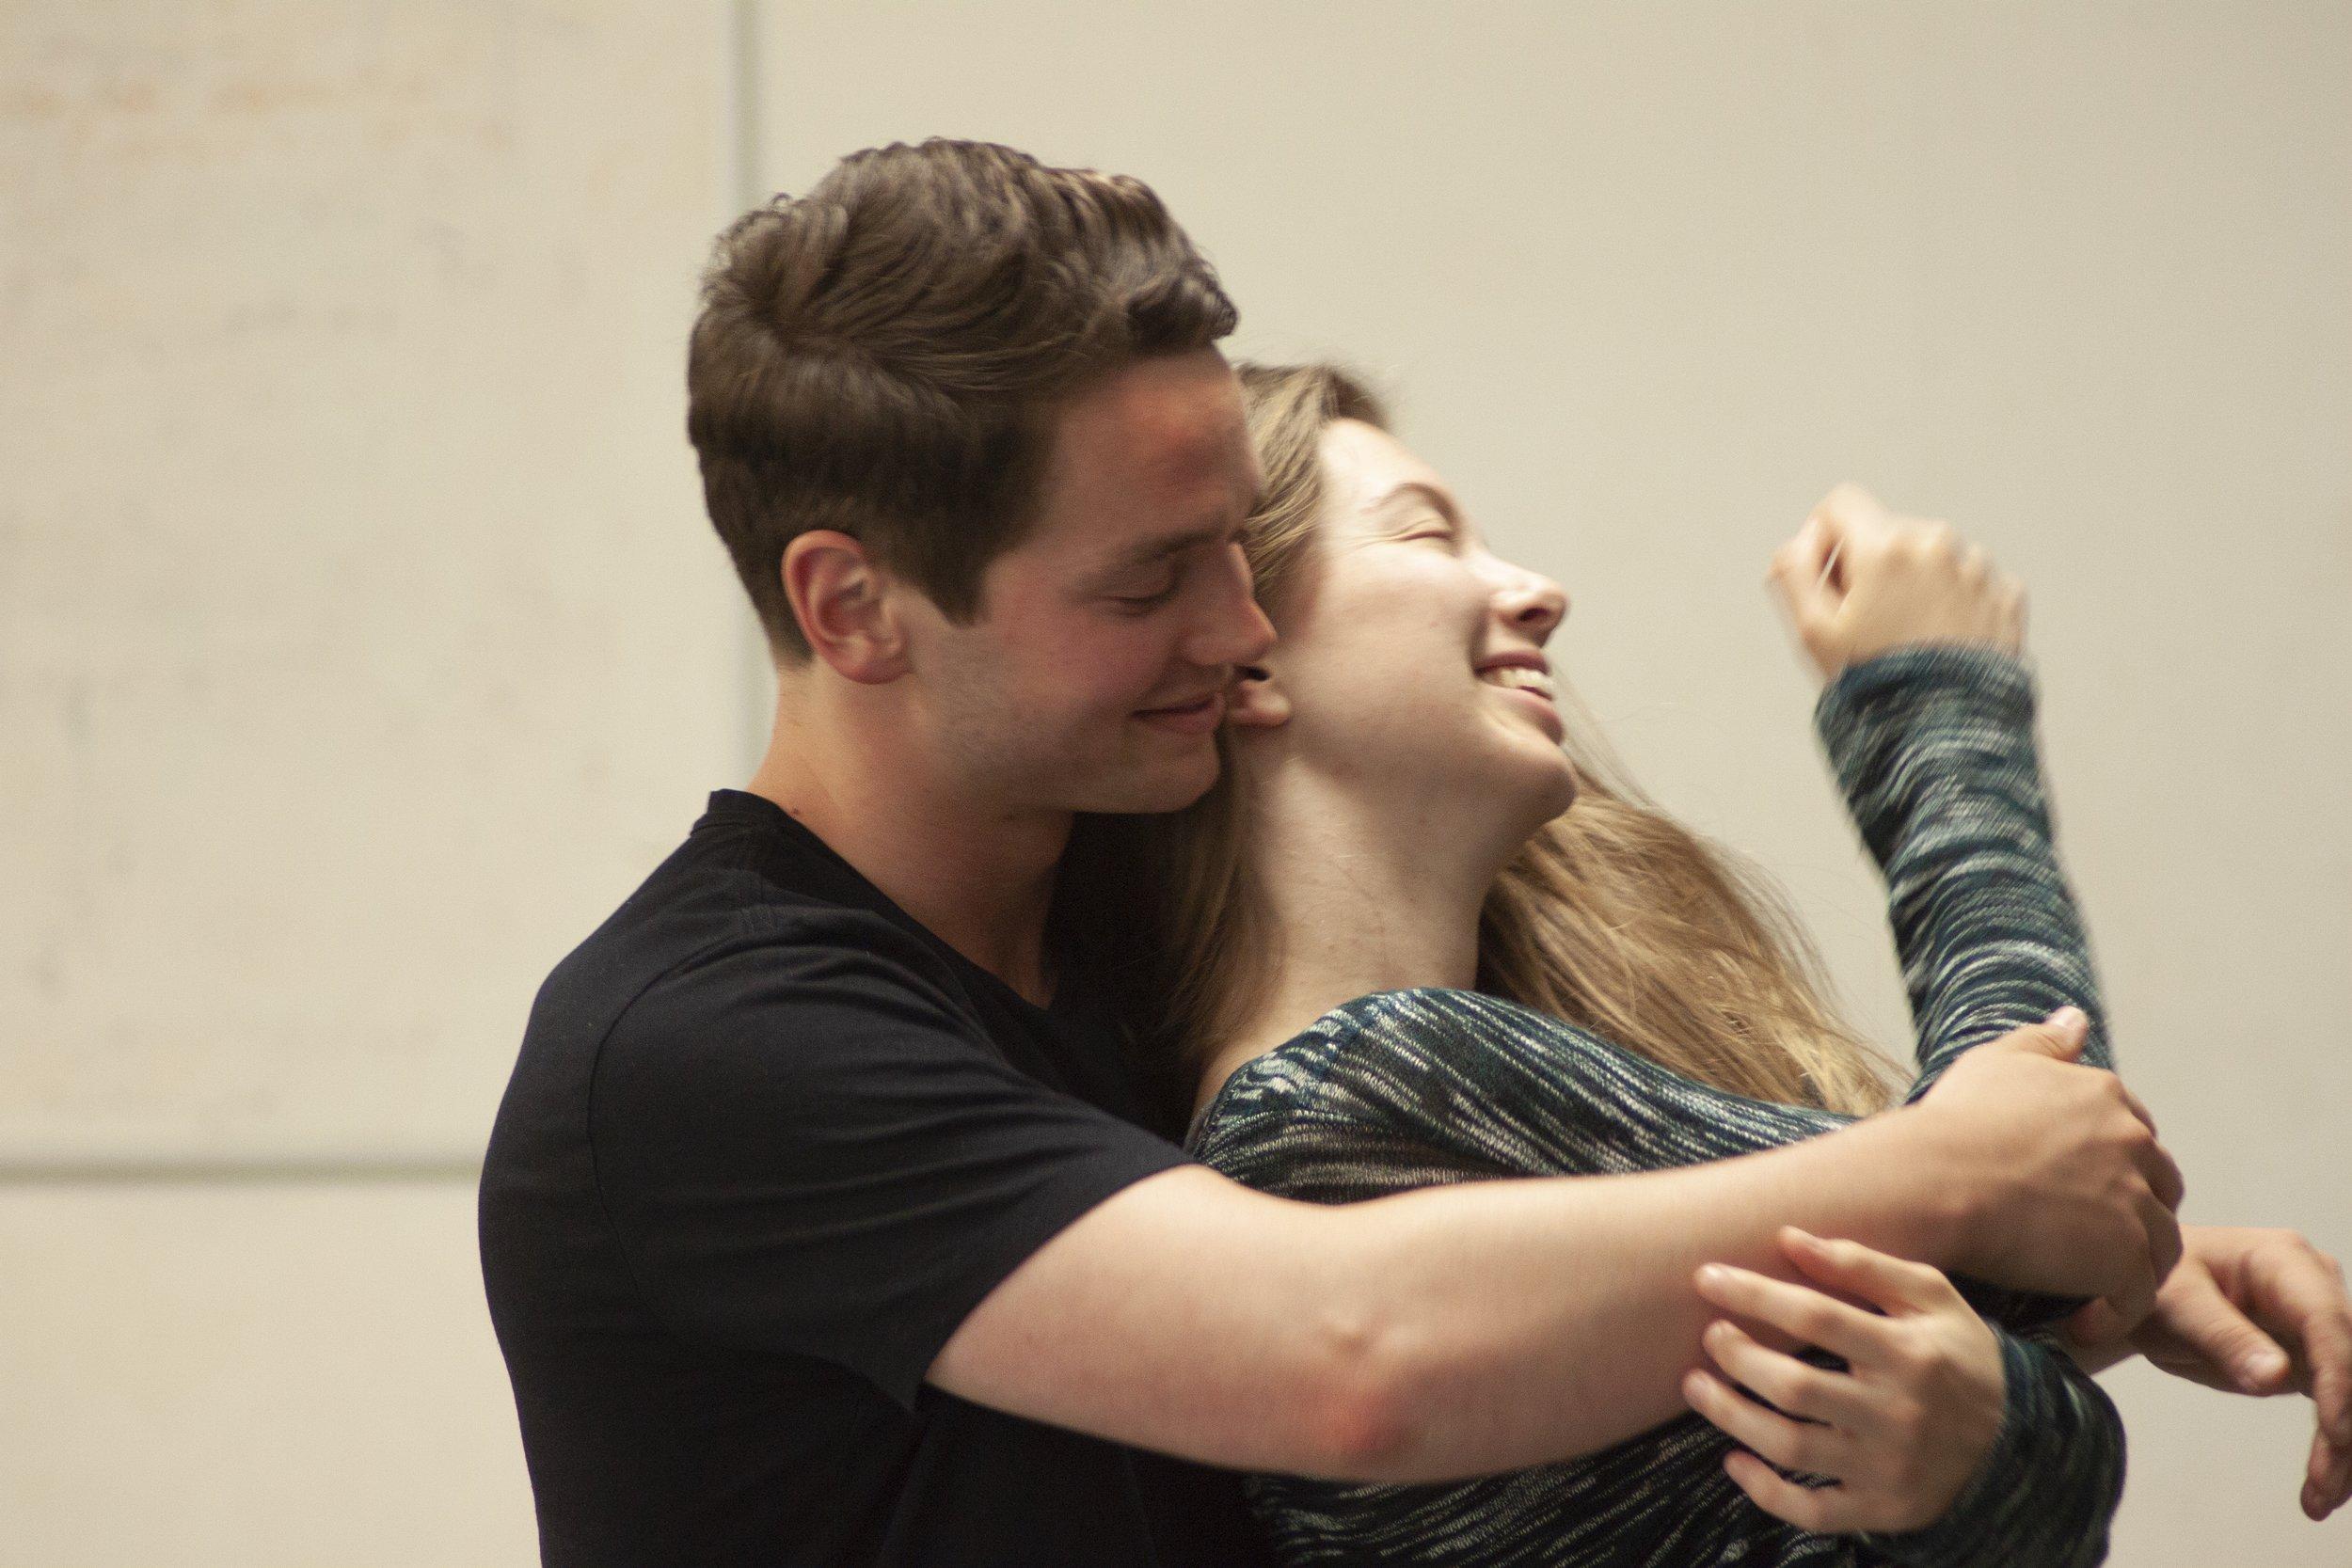 George John (Christian) and Kathryn Crosby (Laura), rehearsal image